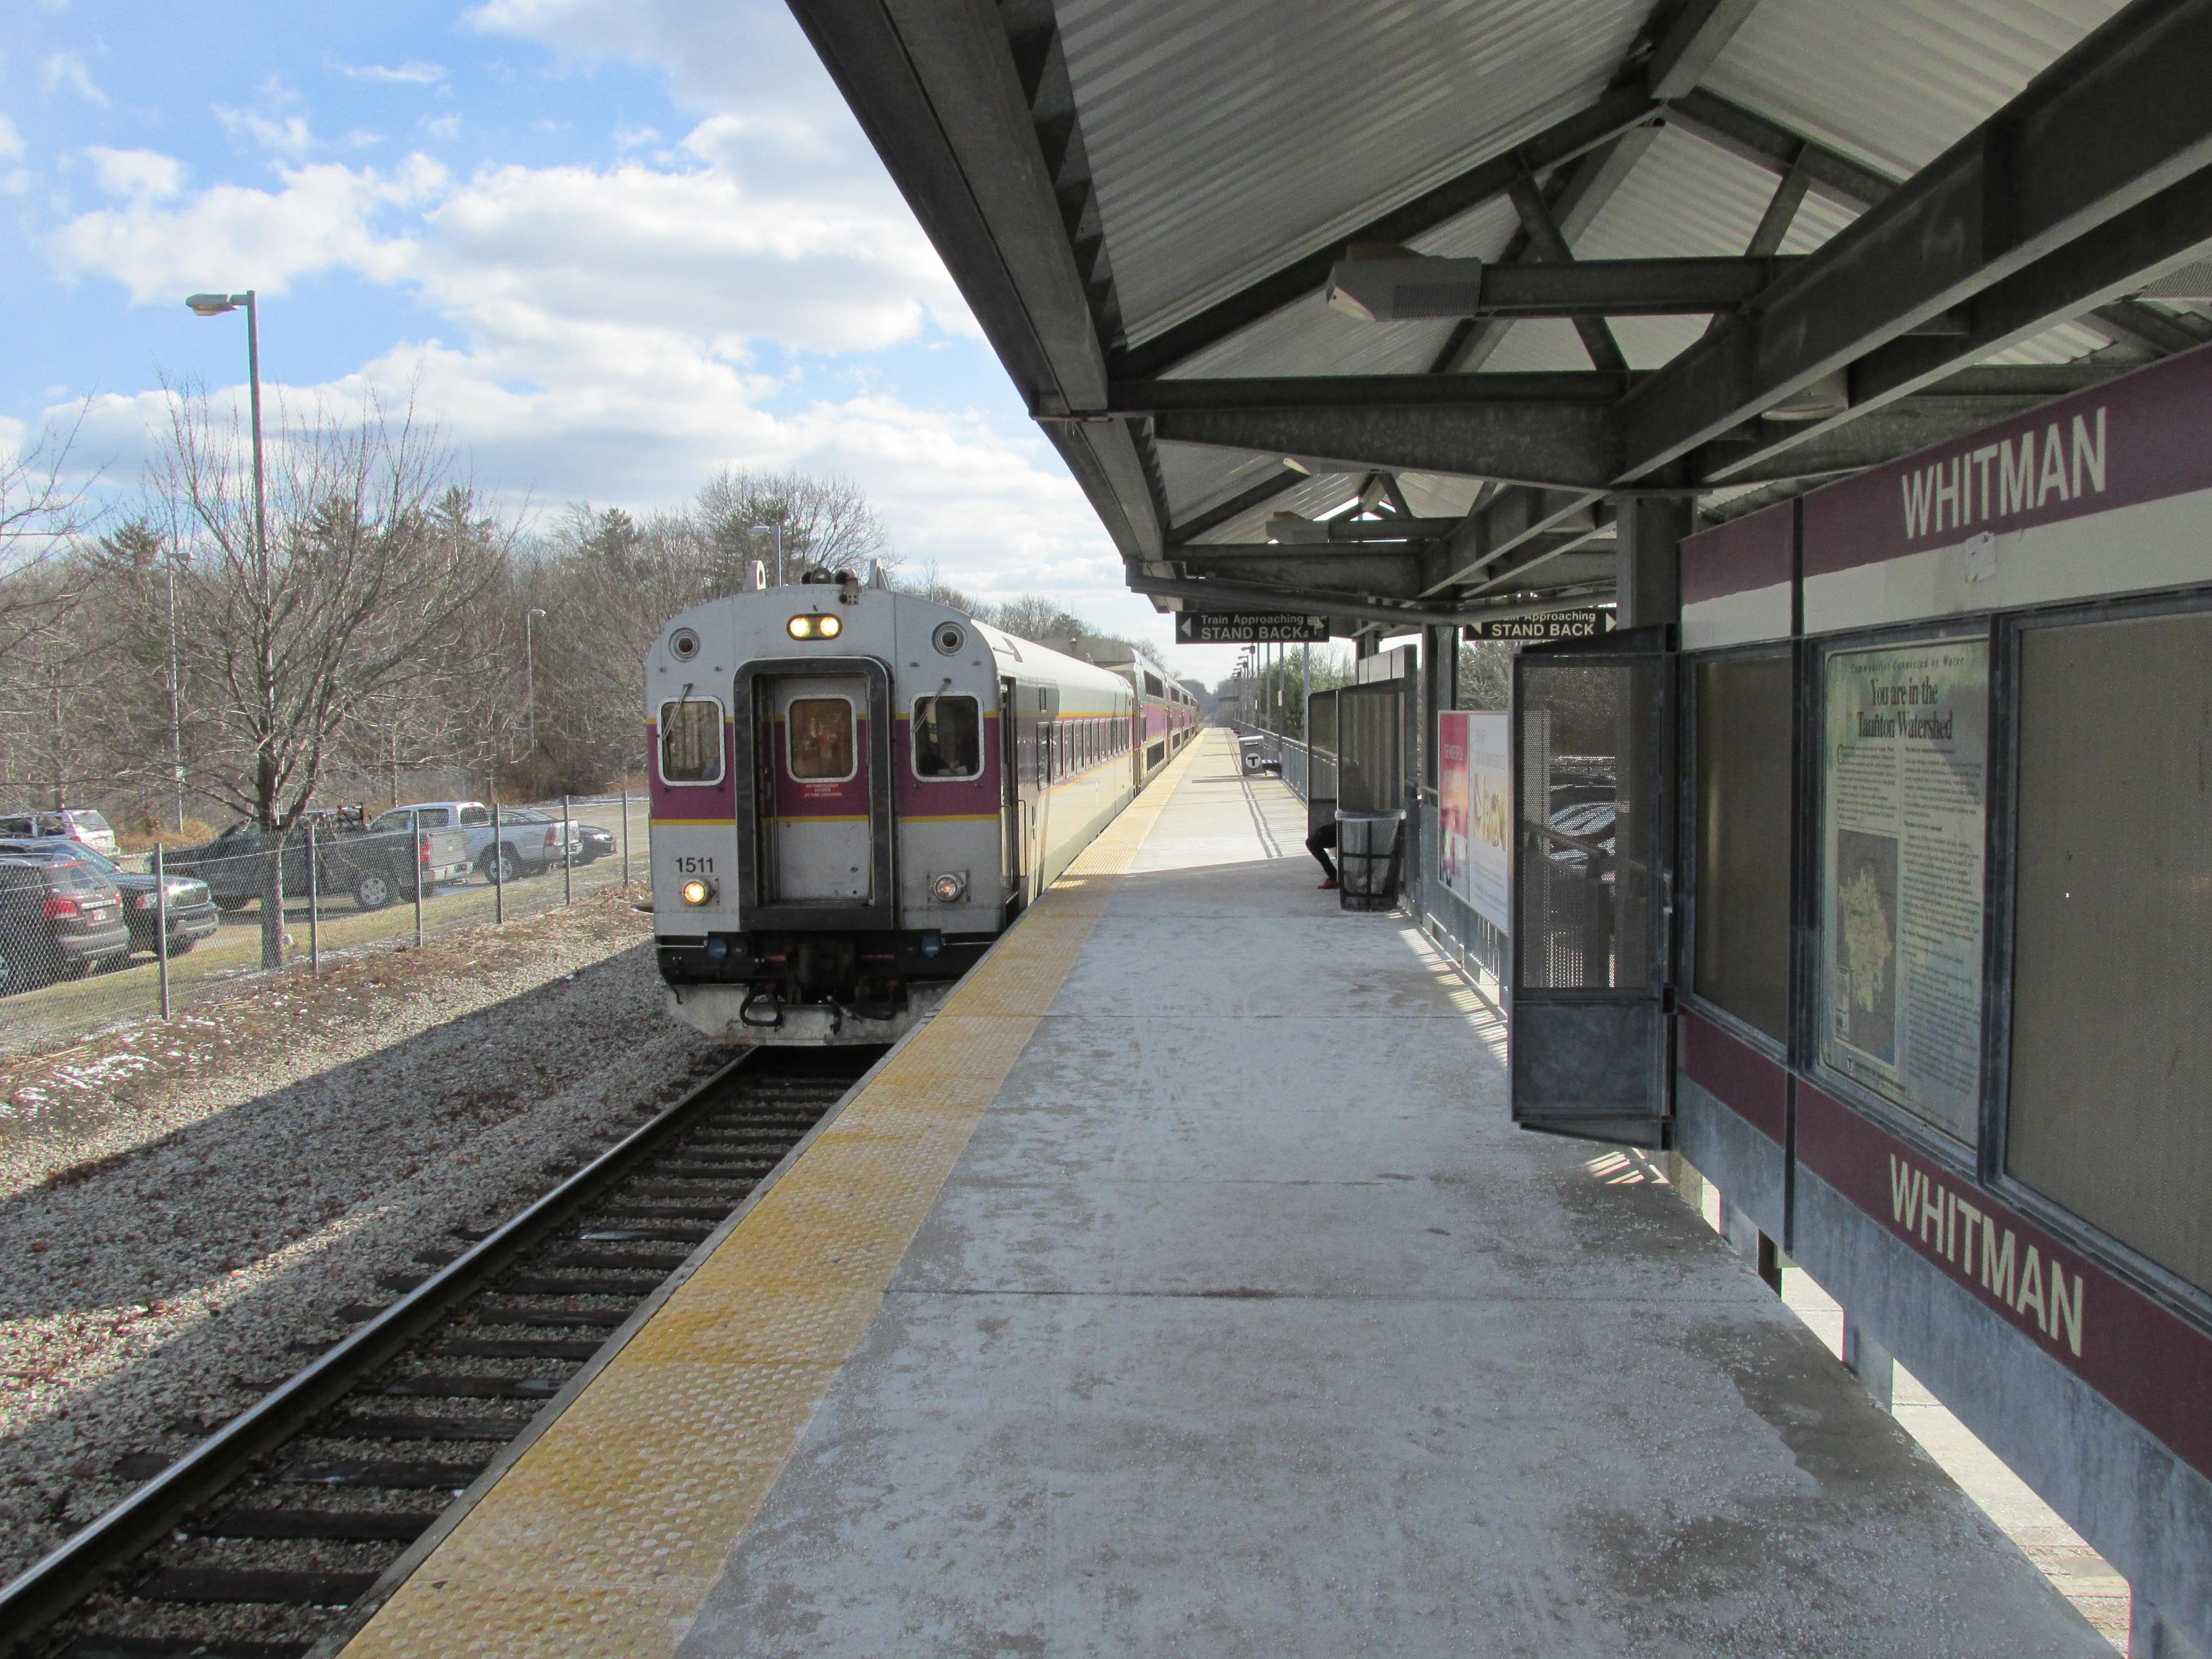 Cars On Line >> File:Inbound train, Whitman MBTA station, Whitman MA.jpg ...